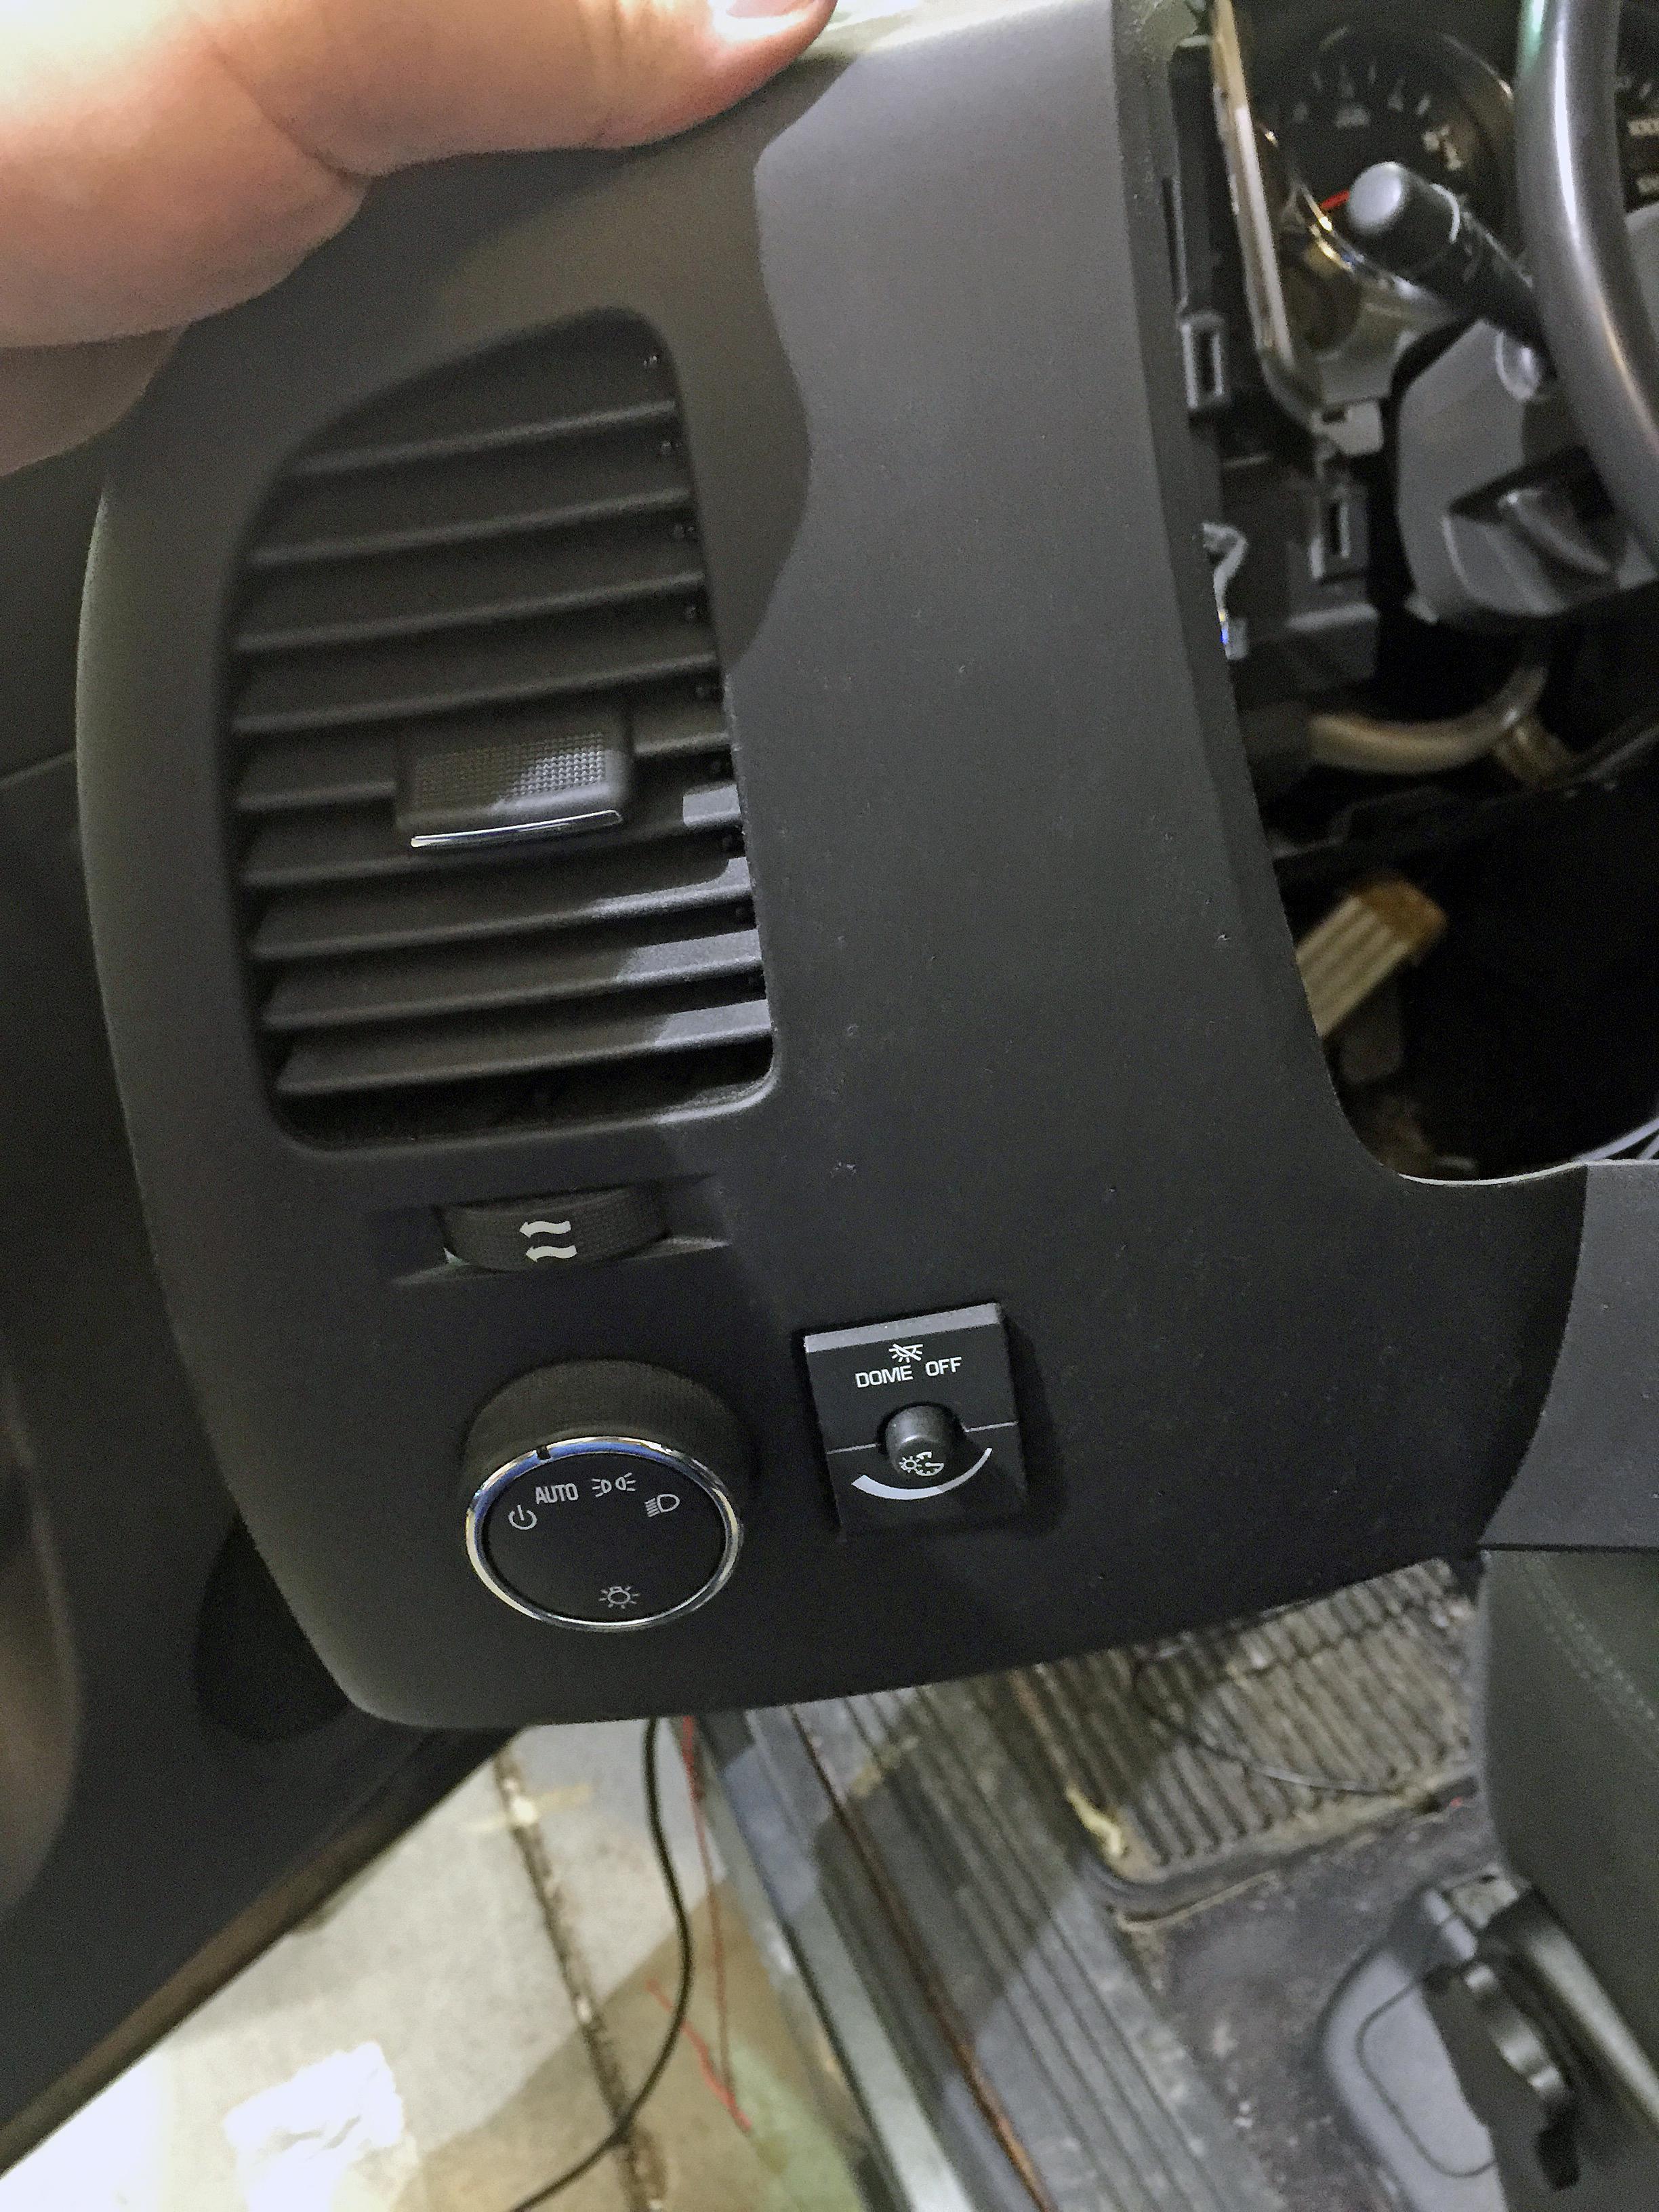 Putco Luminix Light Bar Lighbar LED Installation install installed on GMC Sierra Chevy Silverado by Global High Performance Best wholesale auto parts distributor exporter international